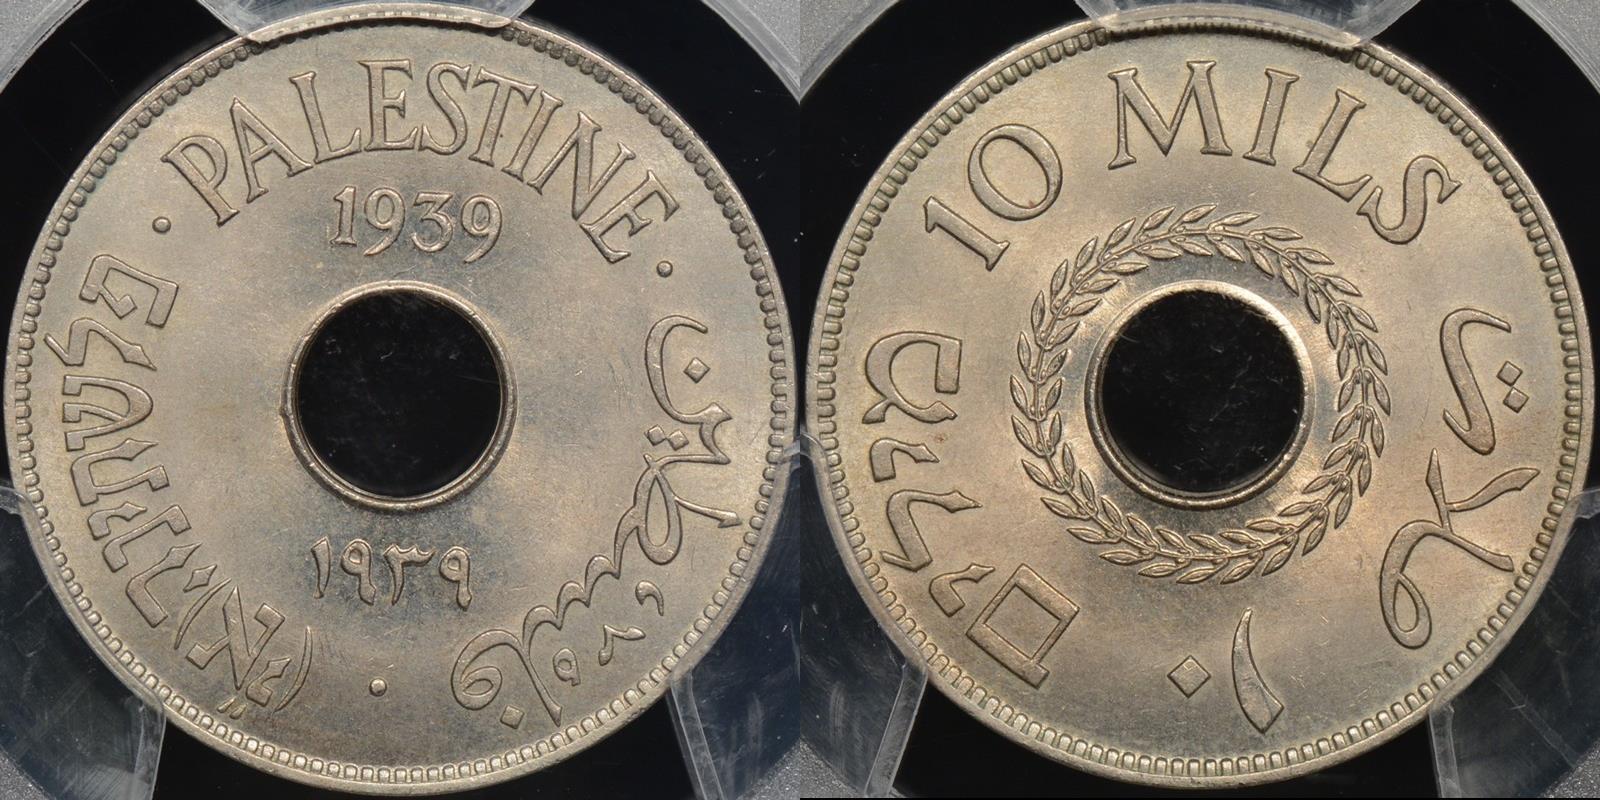 Palestine 1939 10 mils km 4 PCGS MS64 Choice Uncirculated